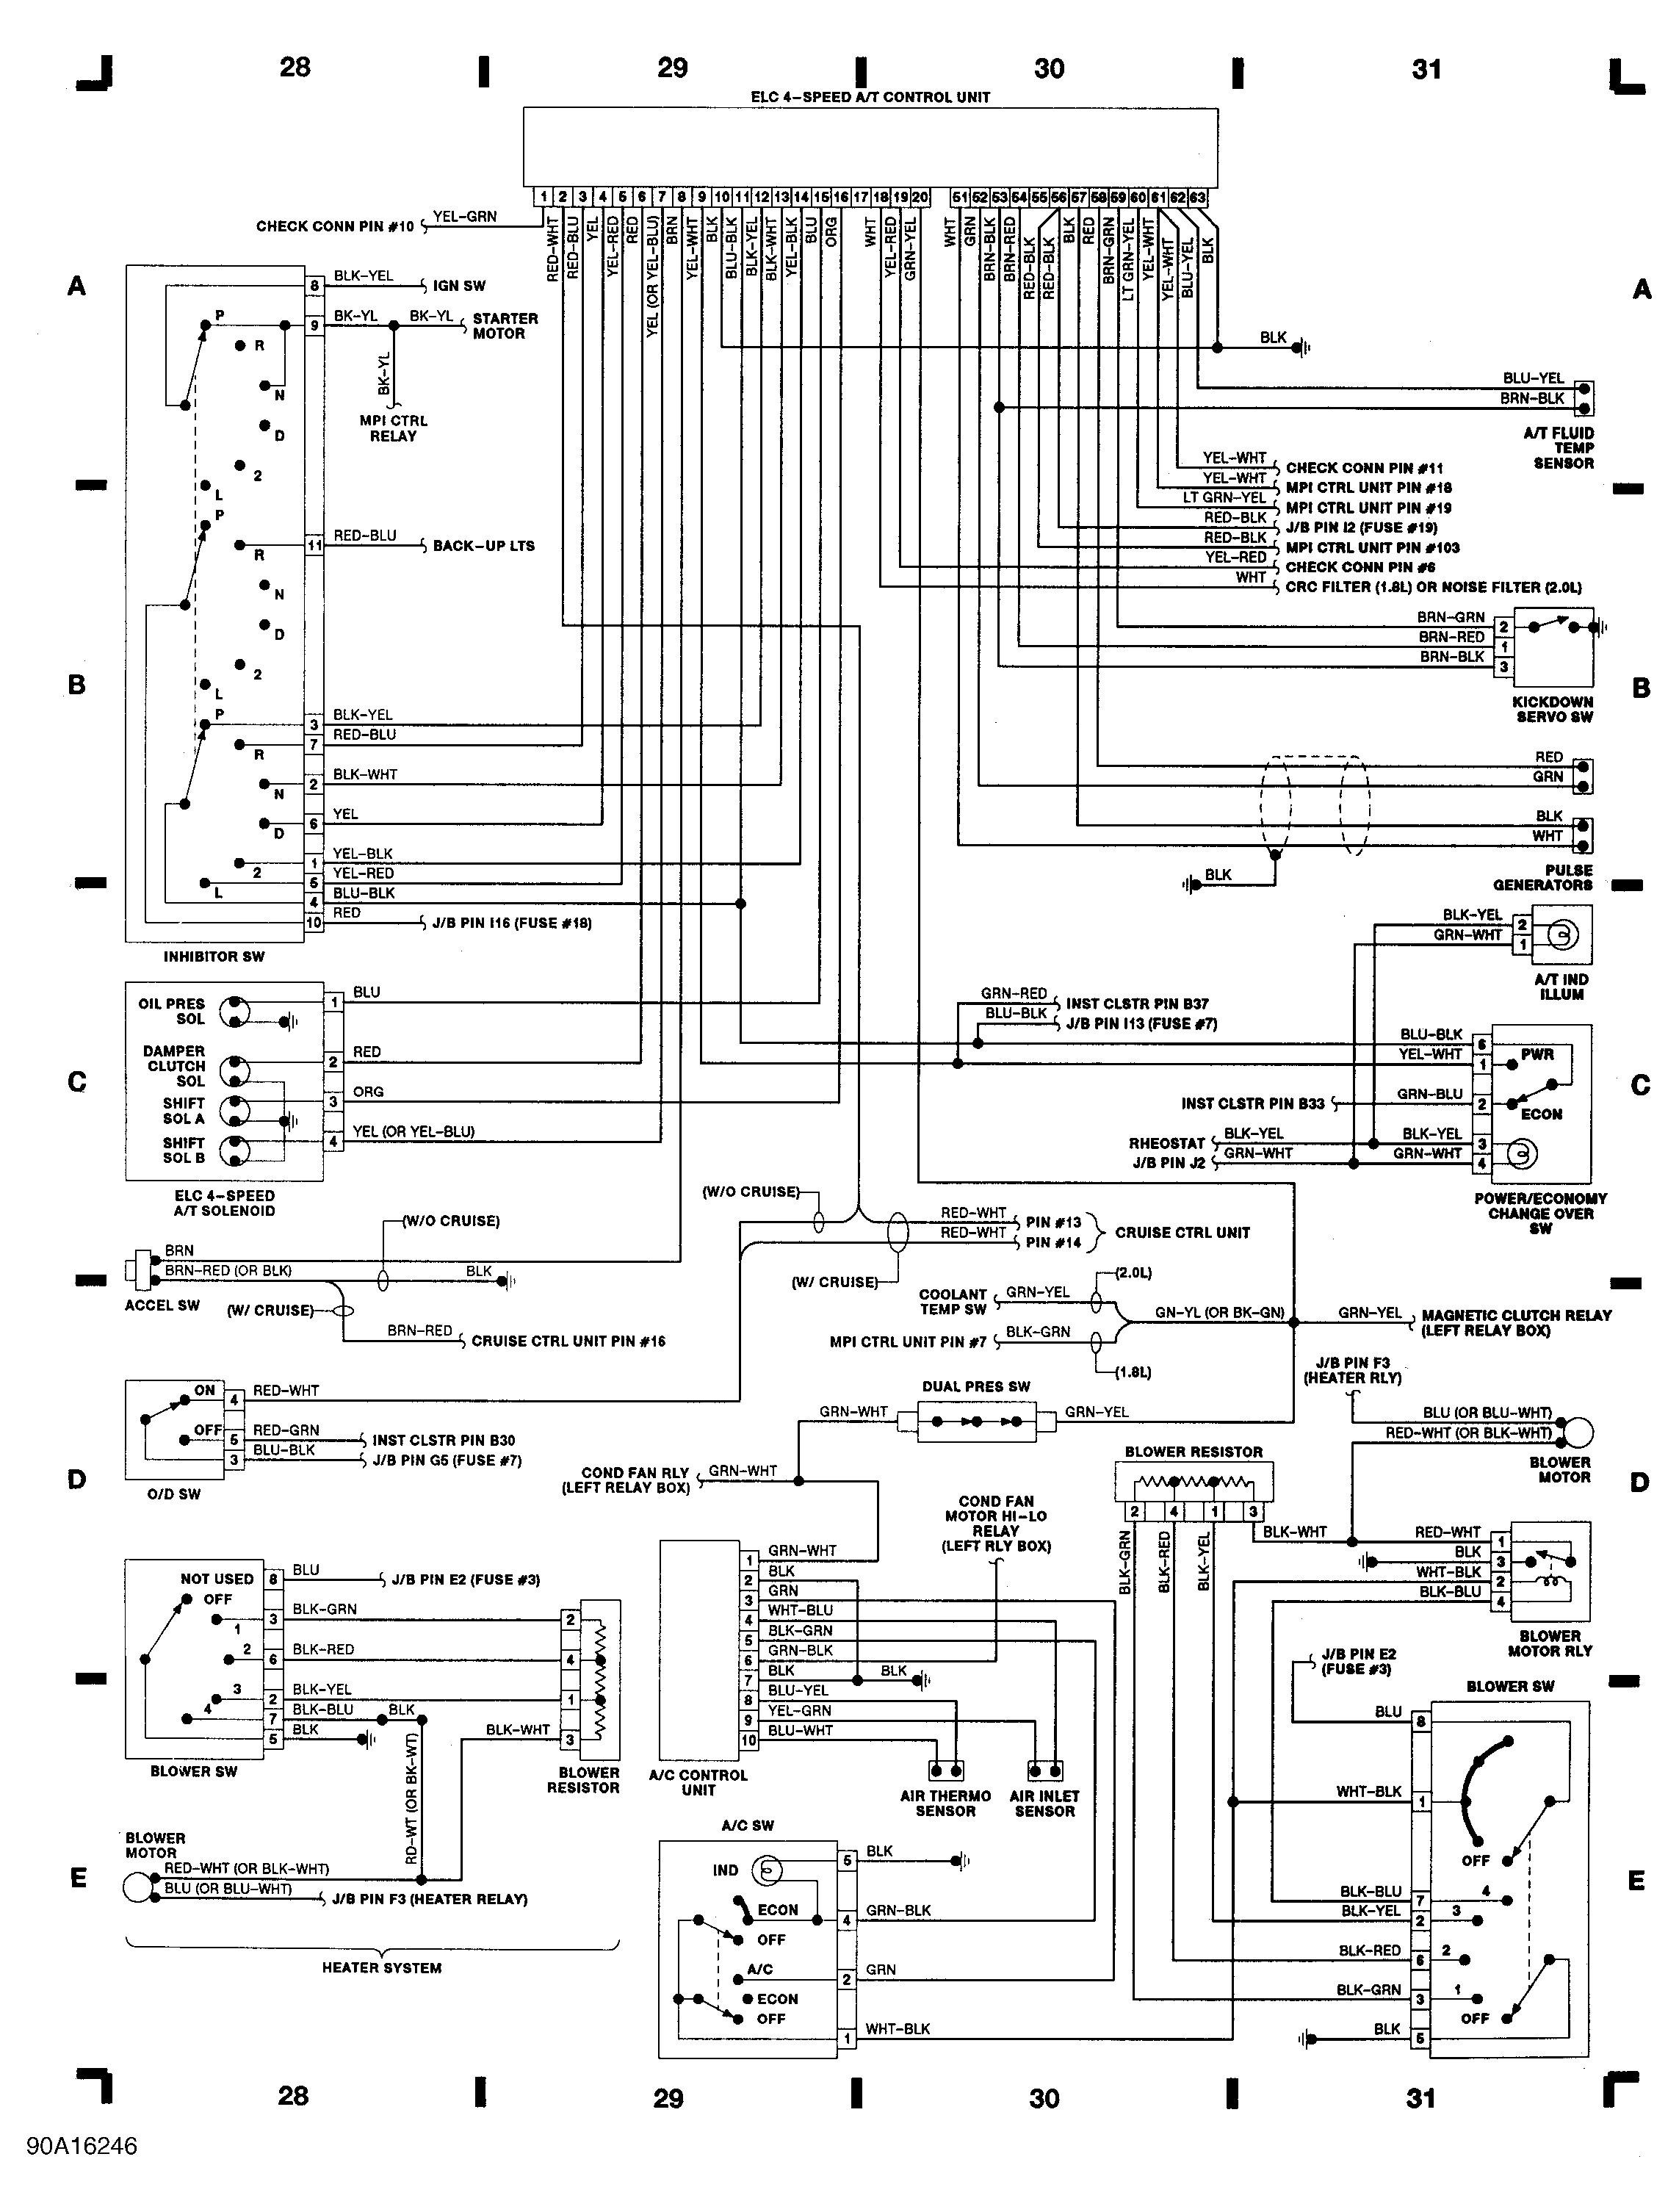 Transmission Diagram Manual Automatic Transmission Wiring Diagram New Automatic Dsm S